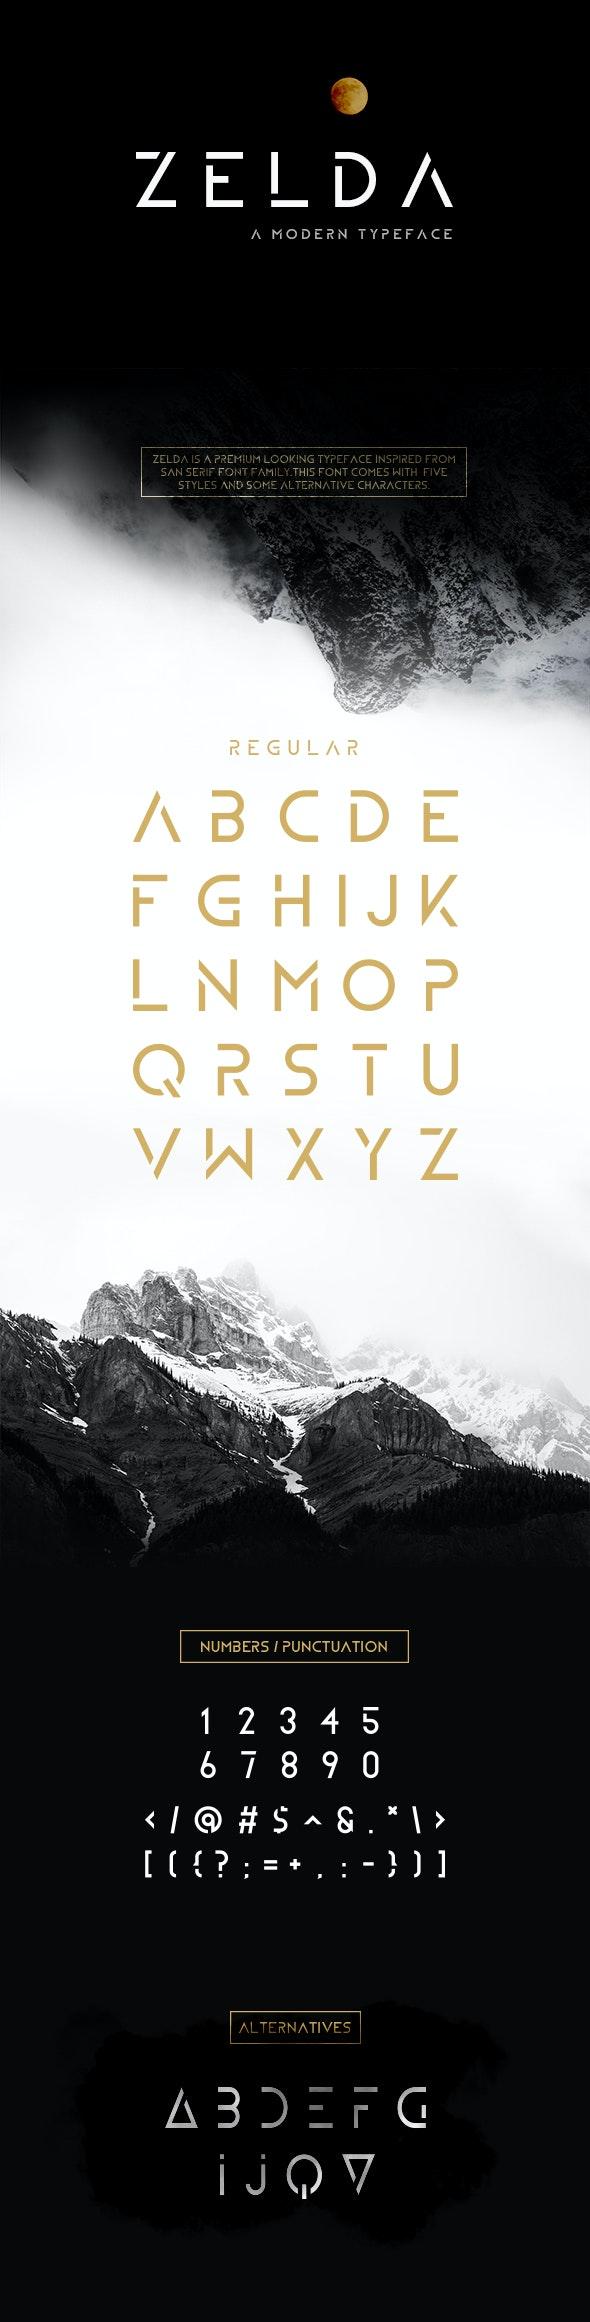 ZELDA Typeface (REGULAR) - Sans-Serif Fonts